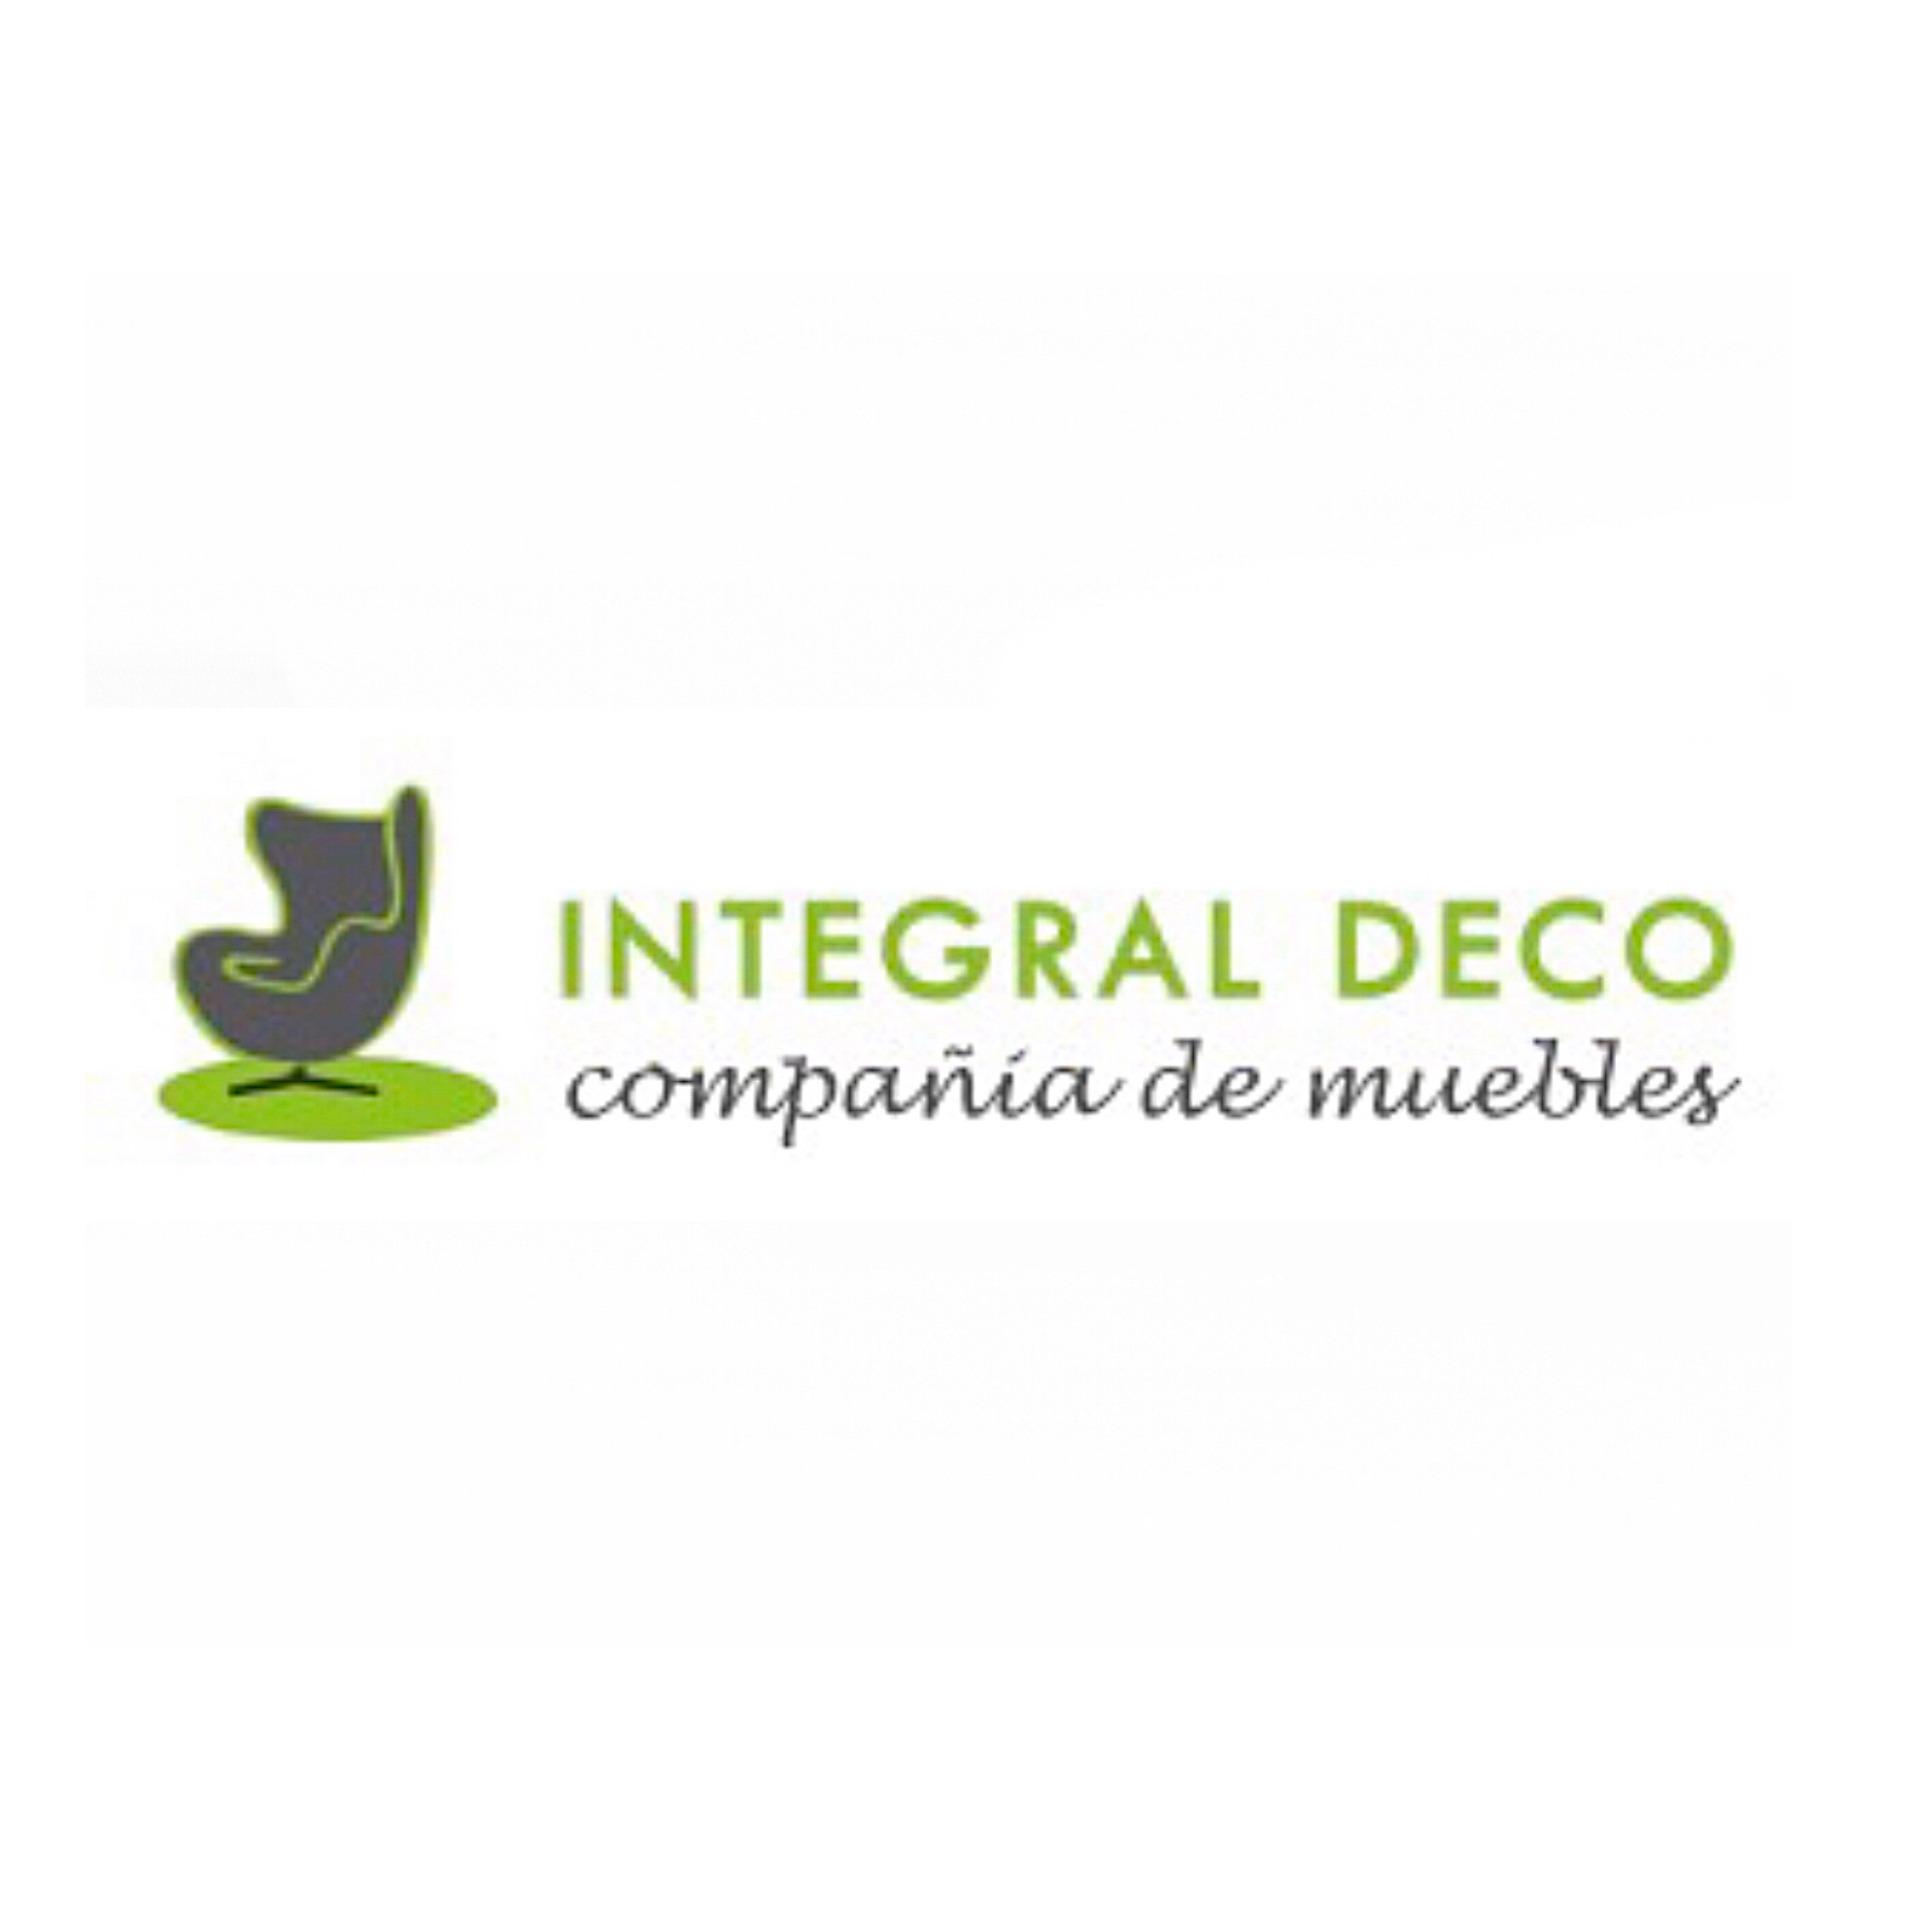 INTEGRAL DECO